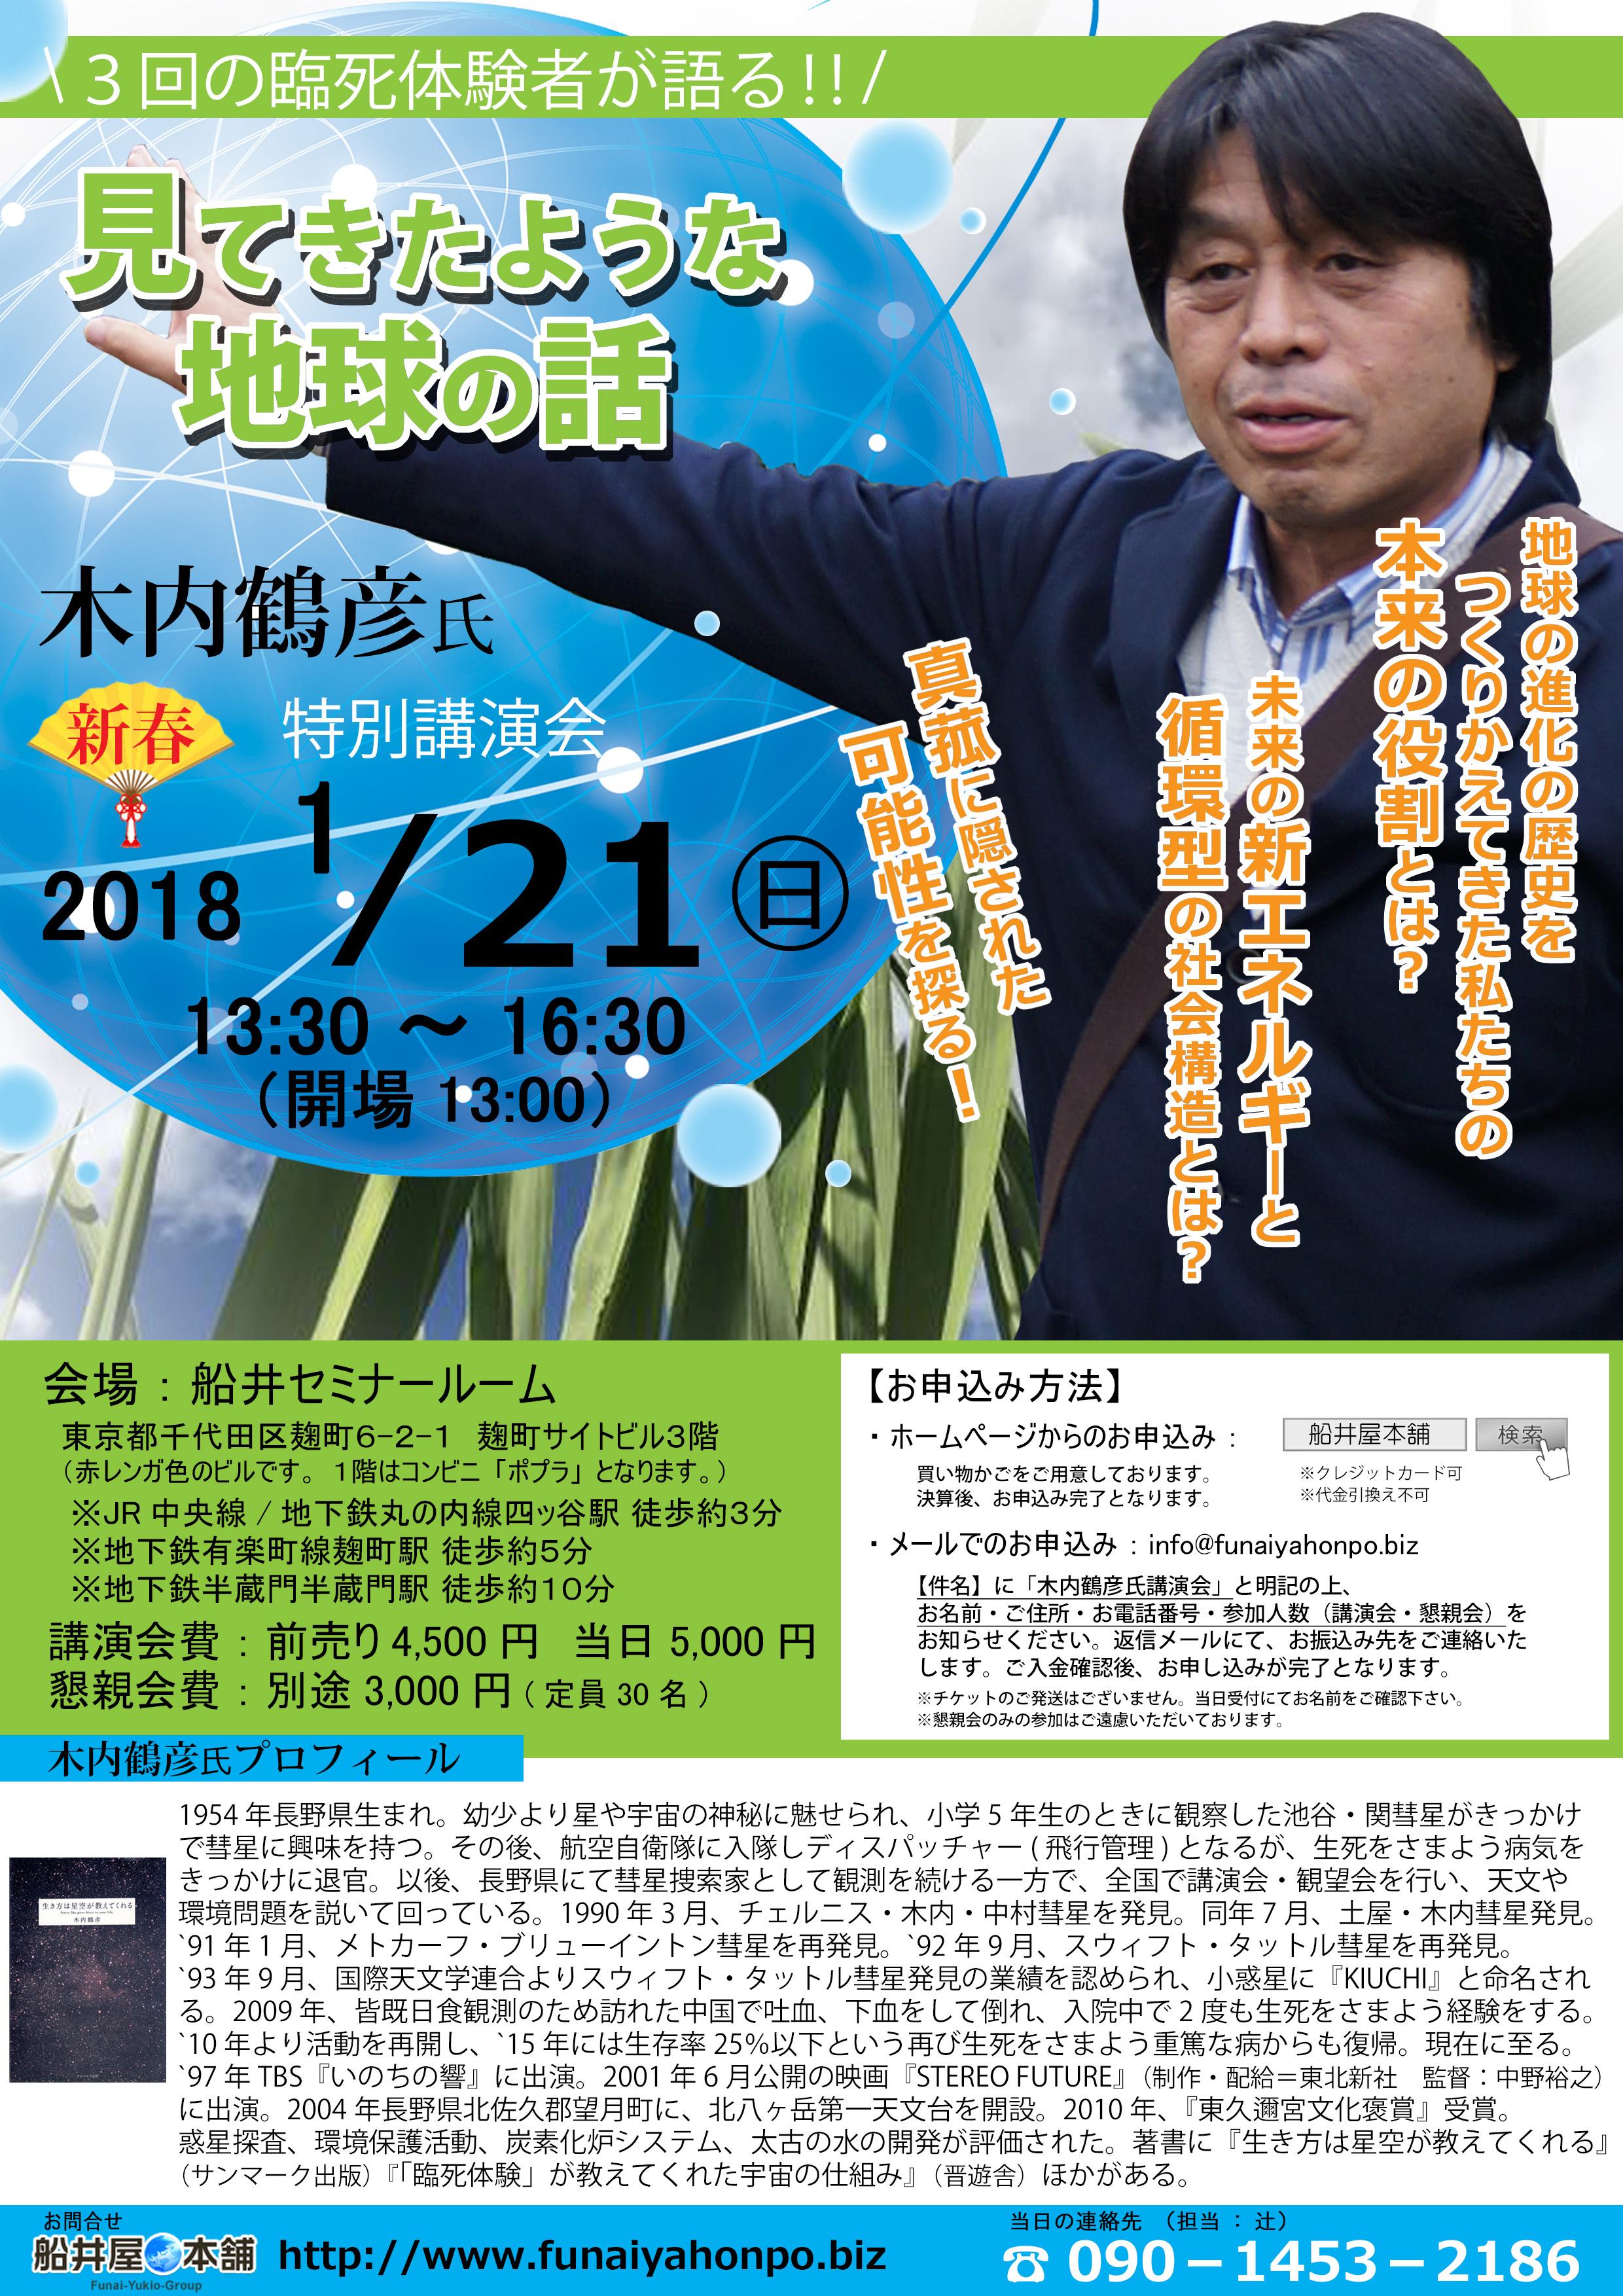 2018.1.21★木内鶴彦氏講演会チラシ.jpg